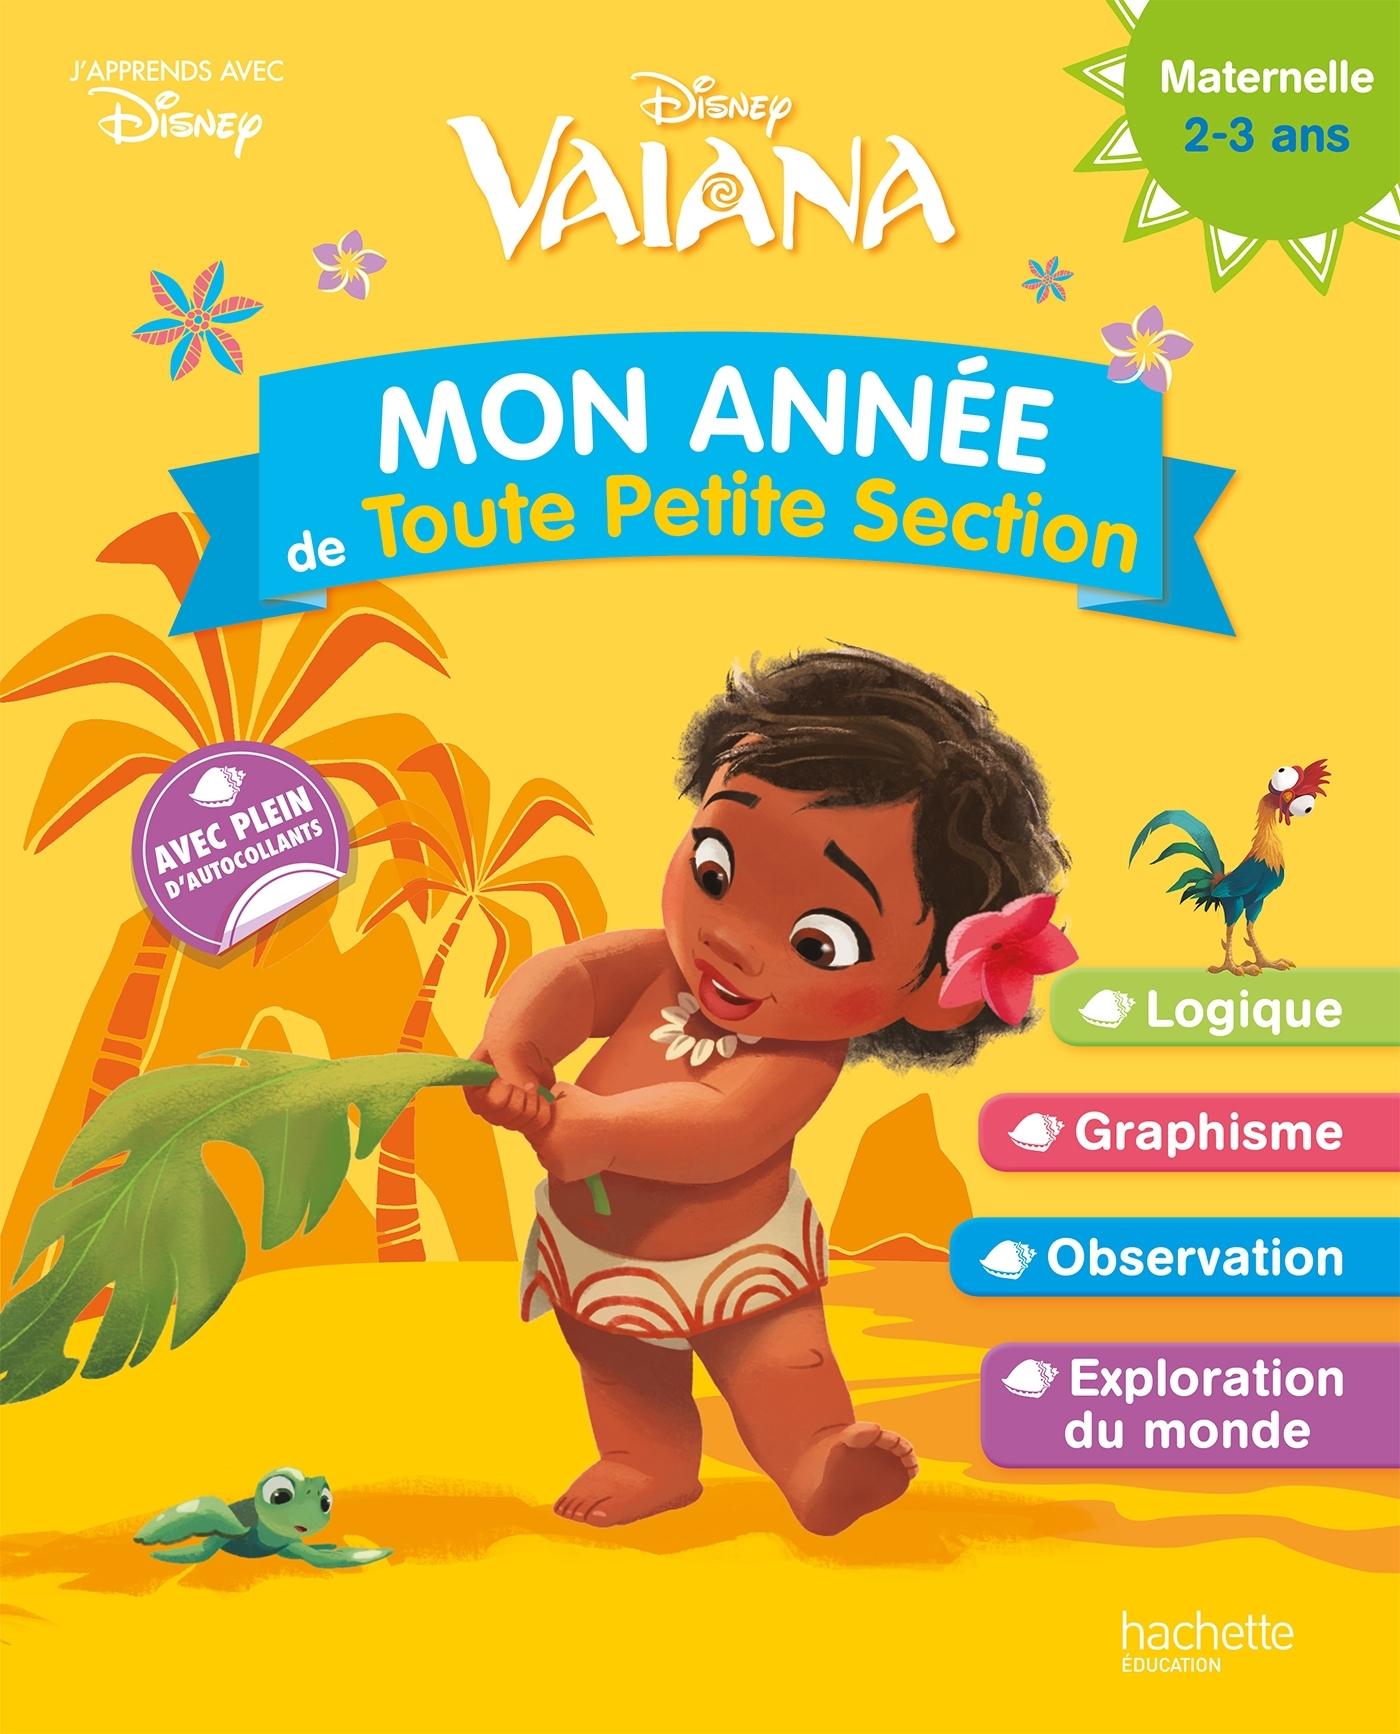 VAIANA MON ANNEE DE TPS (2-3 ANS)